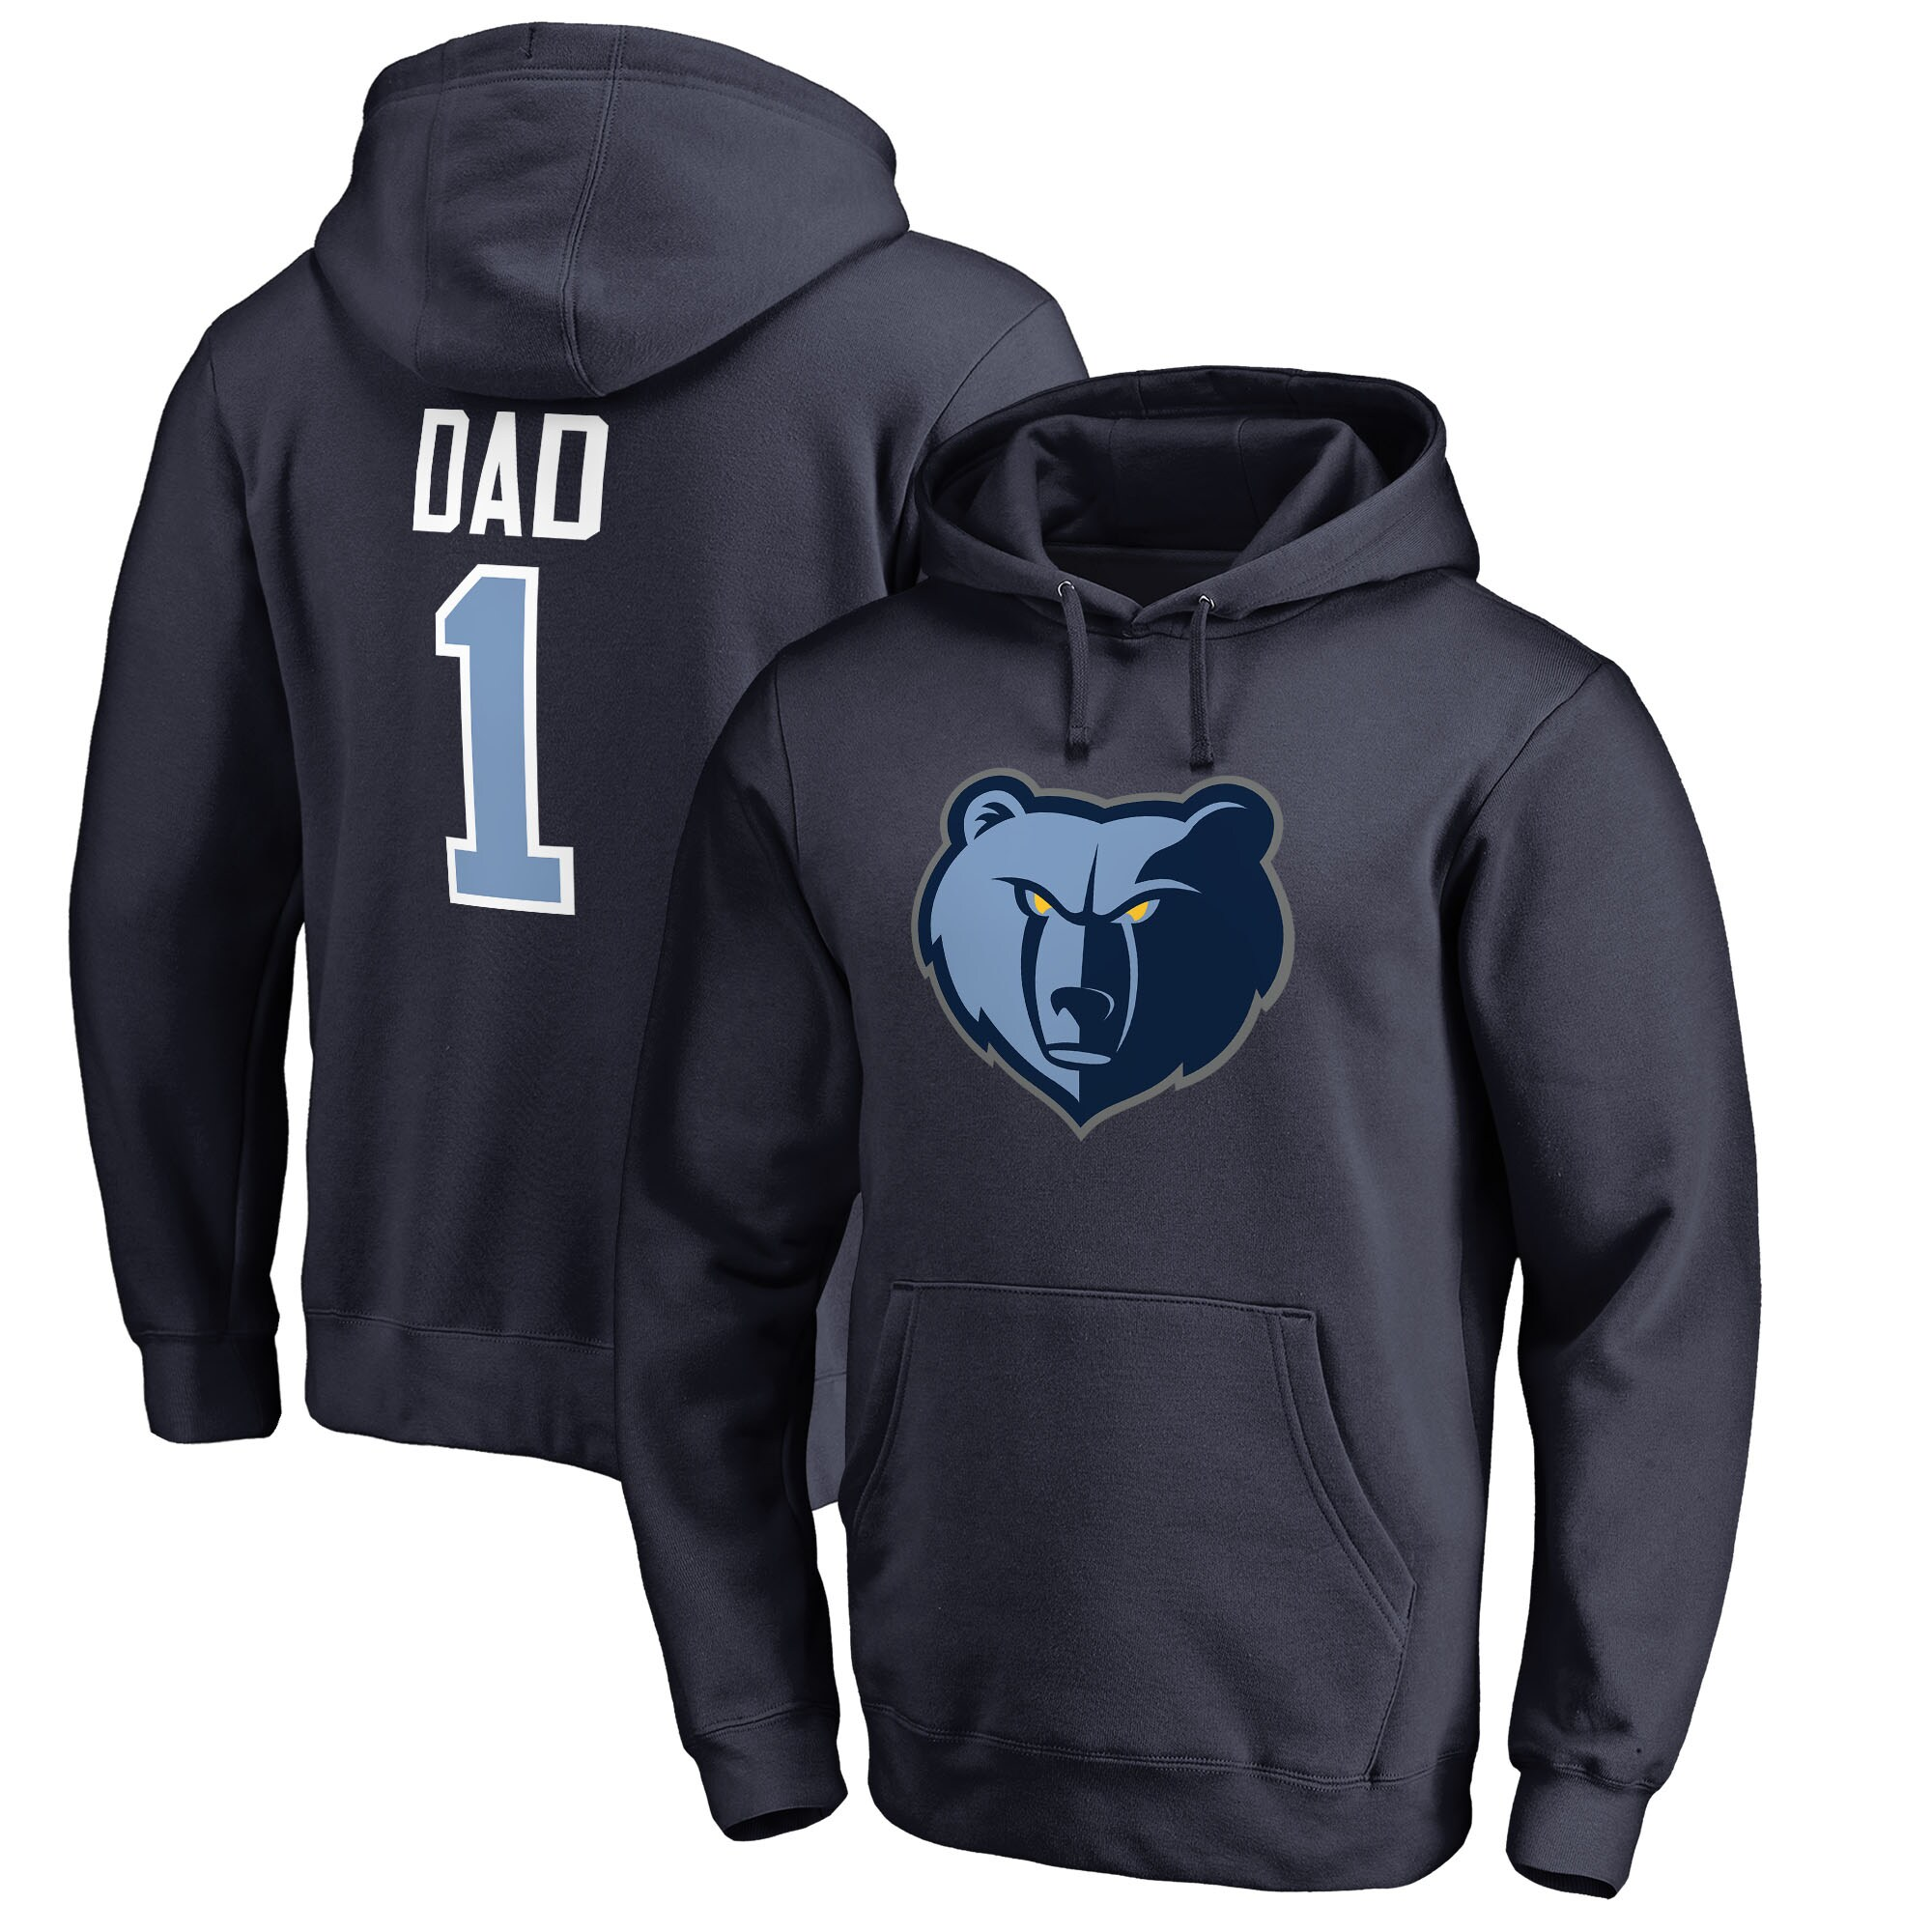 Memphis Grizzlies Fanatics Branded Big & Tall #1 Dad Pullover Hoodie - Navy